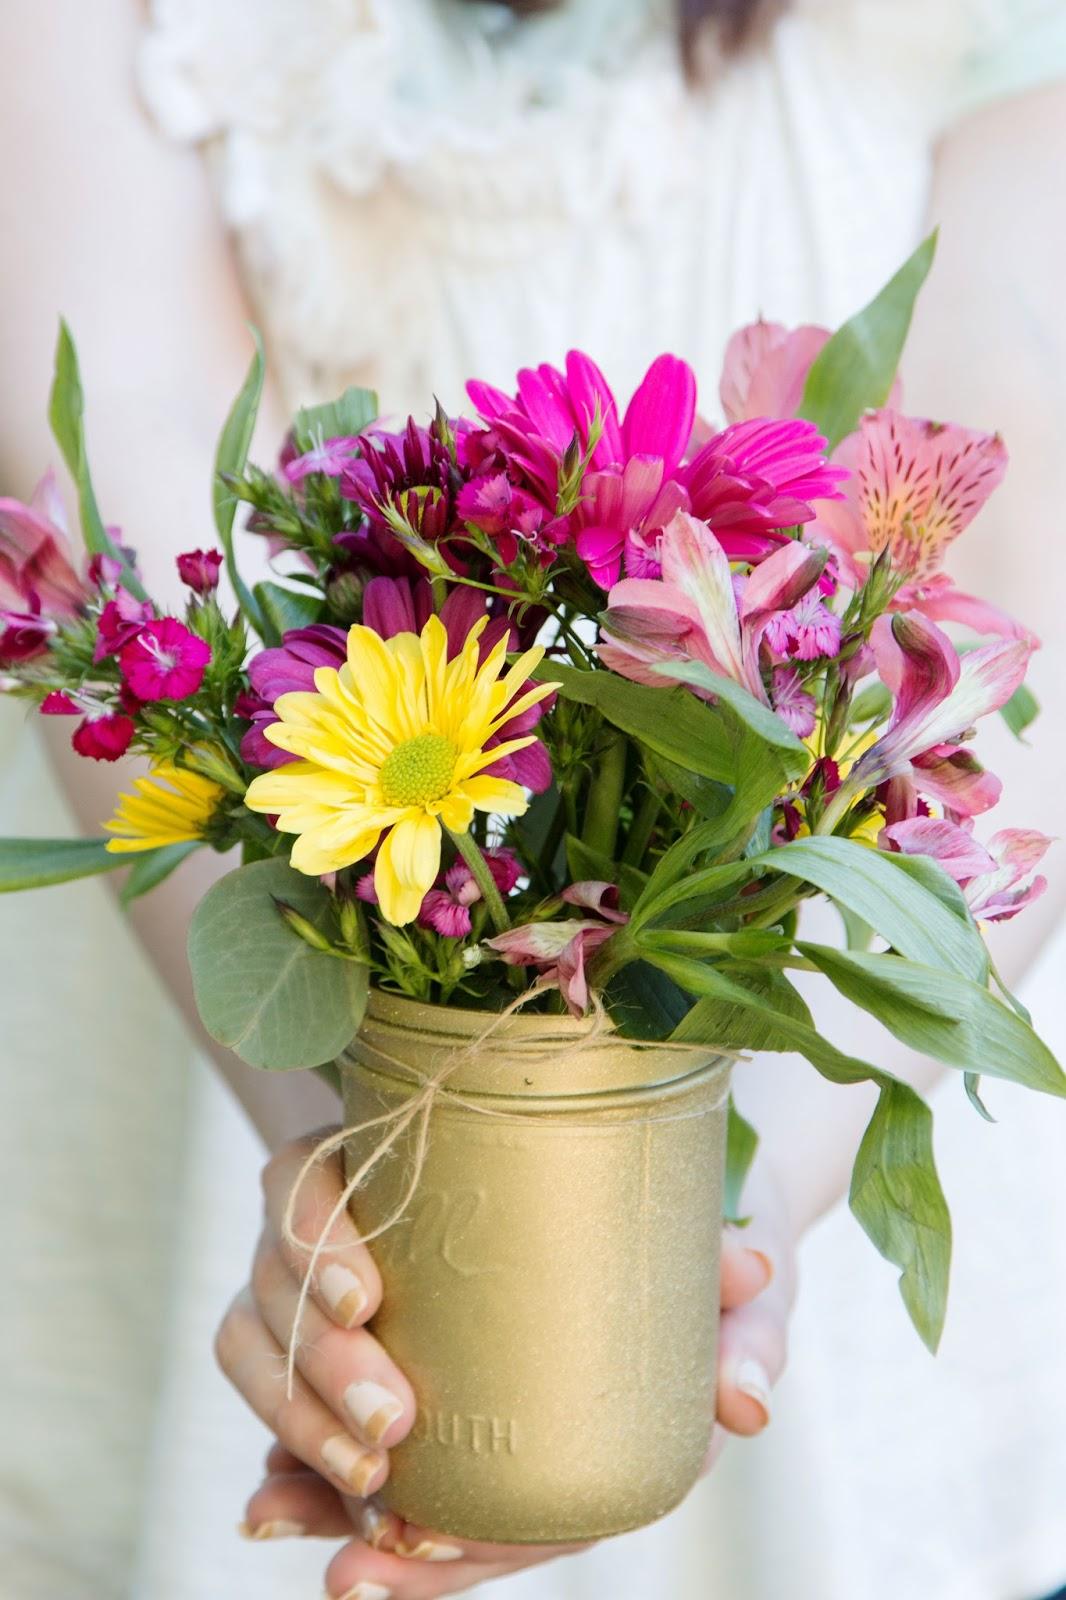 DIY Flower Arrangments and Gold Glitter Vases @craftsavvy @createoften #craftwarehouse #diy #vases #flowers #glamping